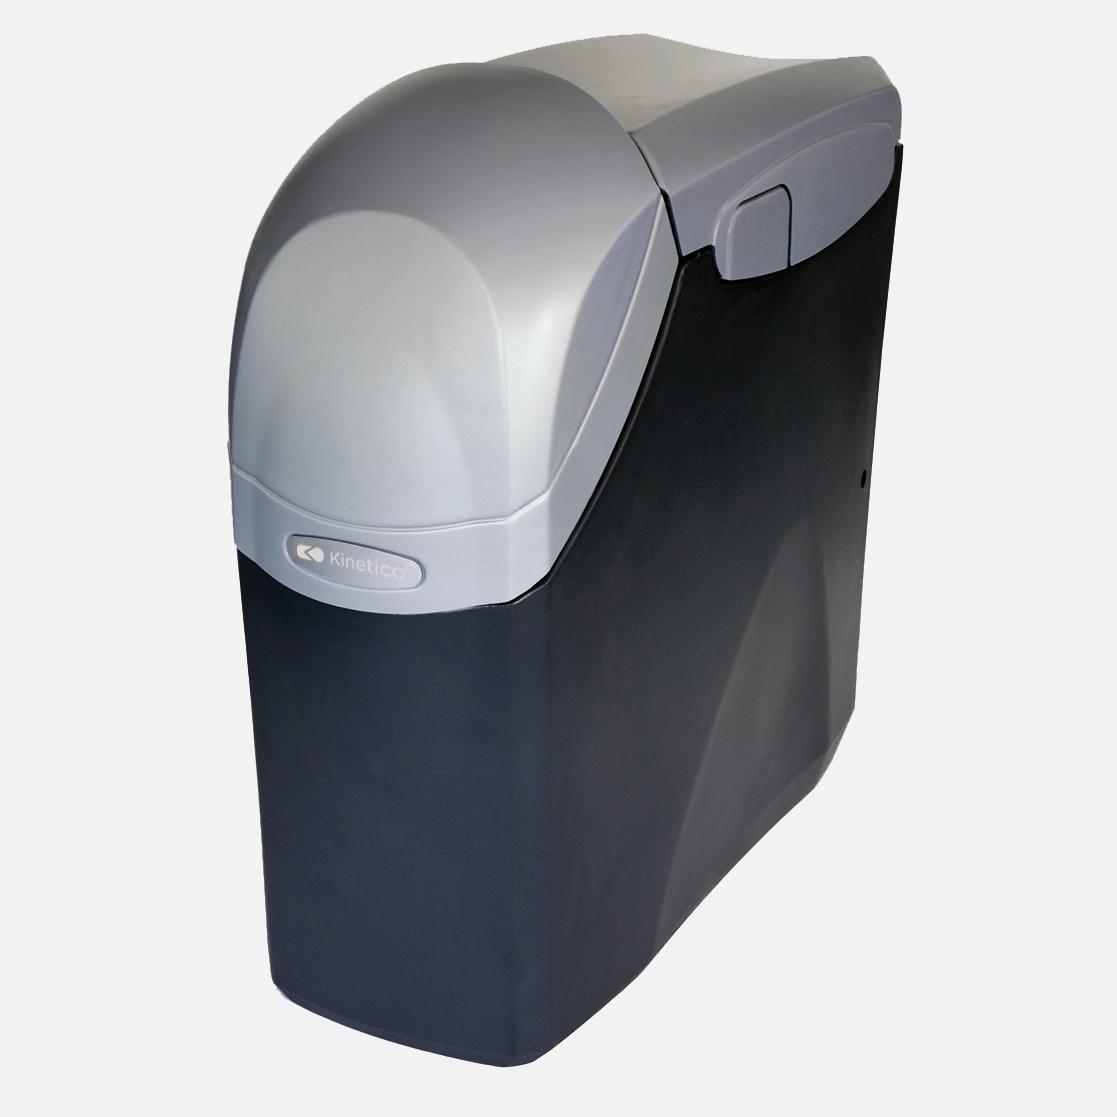 Premier Maxi Water Softener